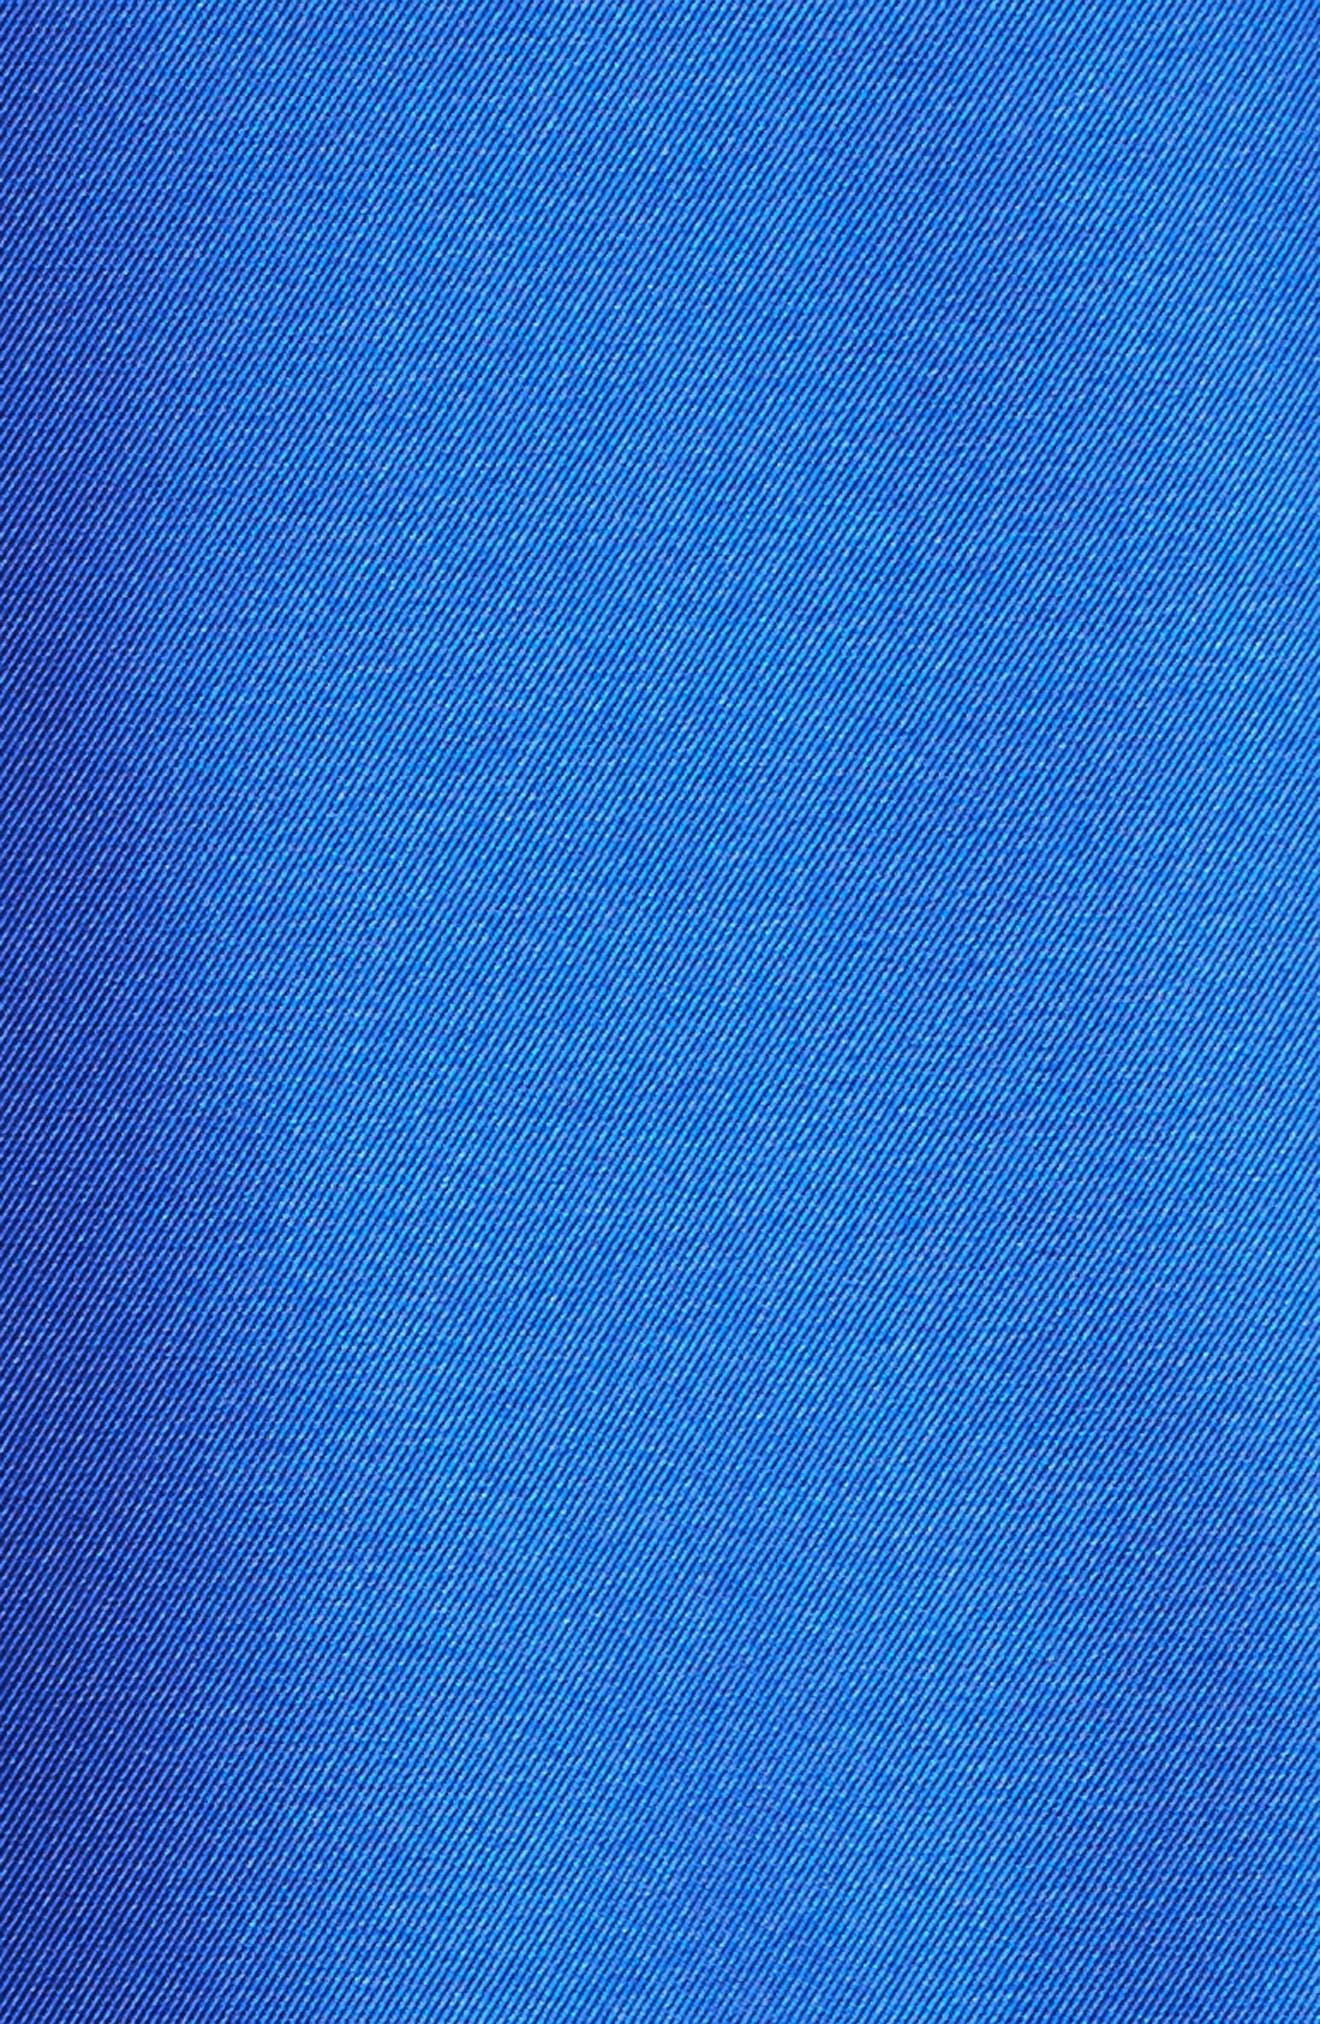 Lace Trim Mikado High/Low Gown,                             Alternate thumbnail 5, color,                             401